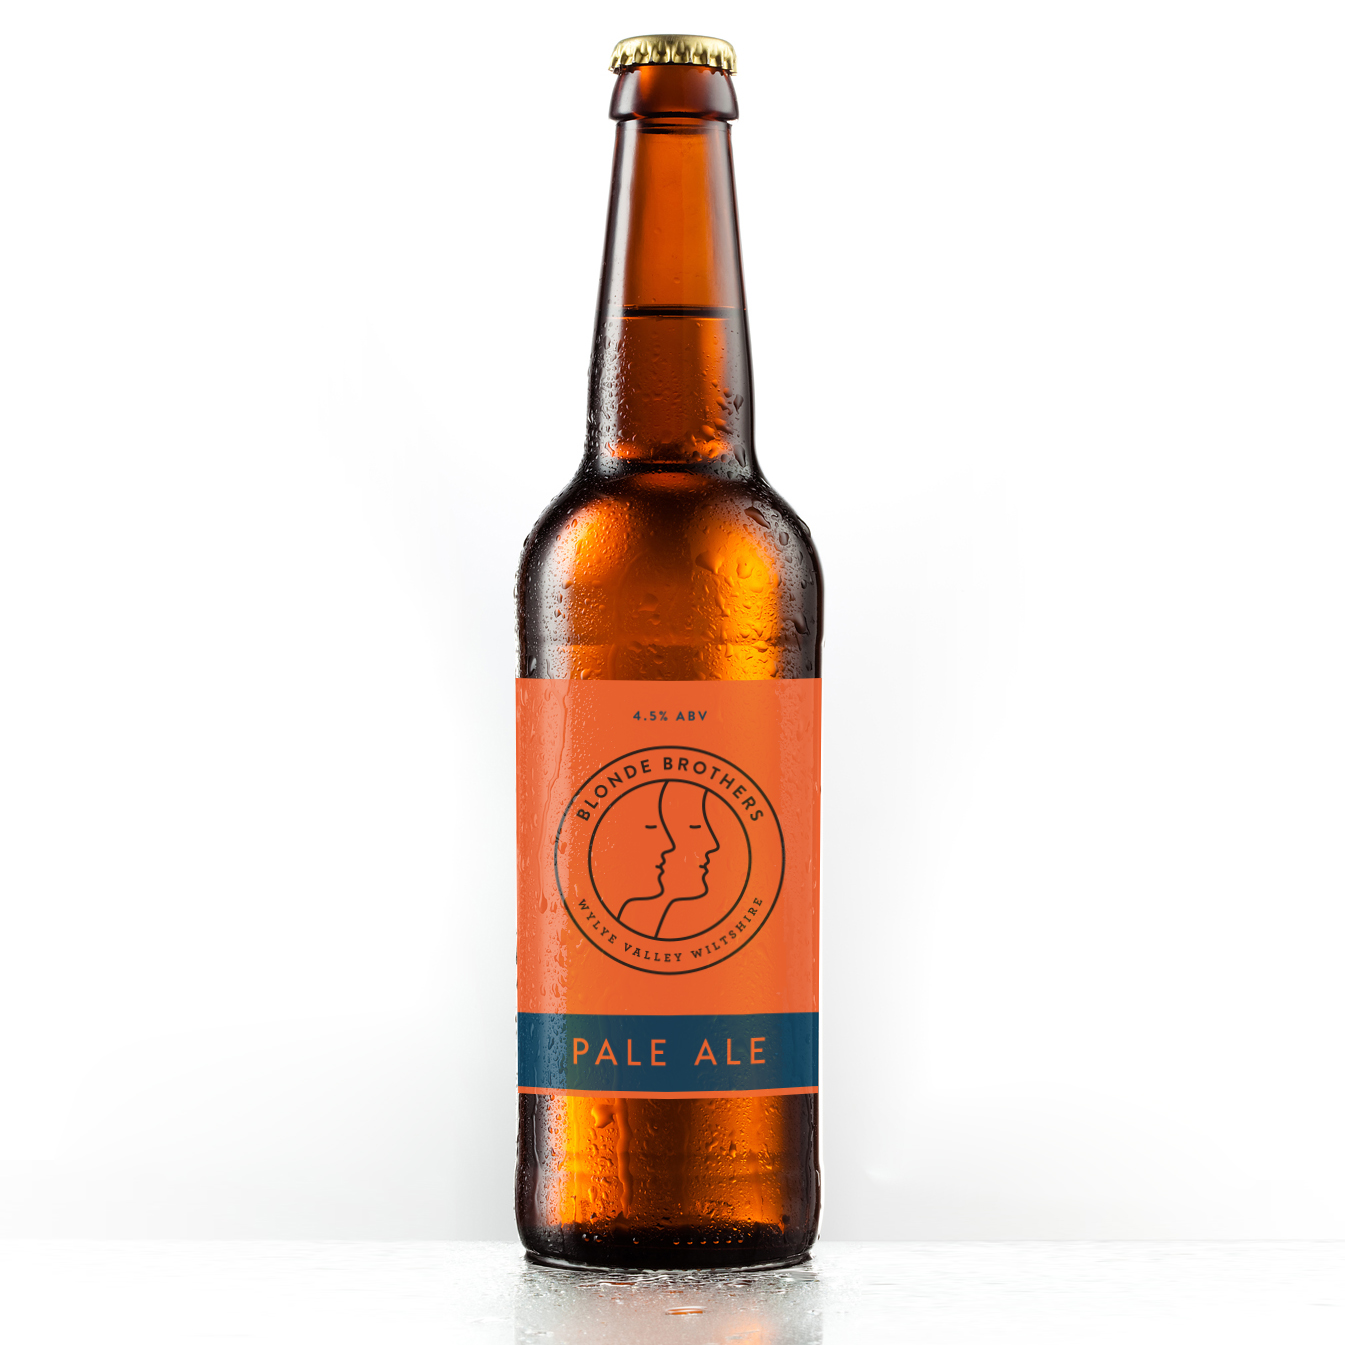 Red beer label packaging designed by Bolter Design